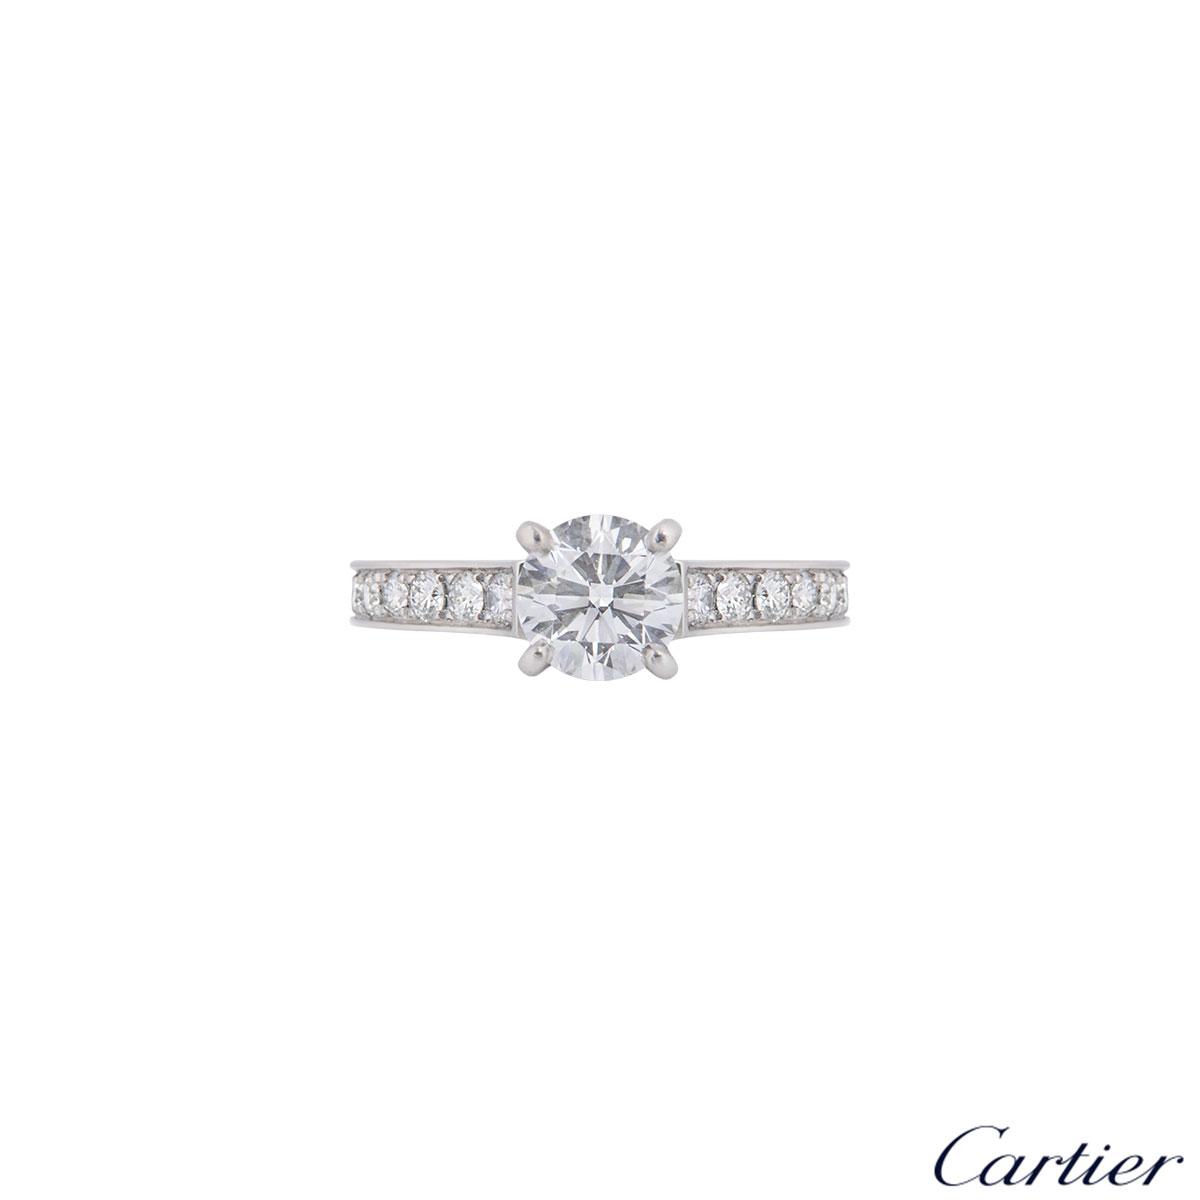 Cartier Platinum Diamond 1895 Solitaire Ring 0.90ct E/VS2